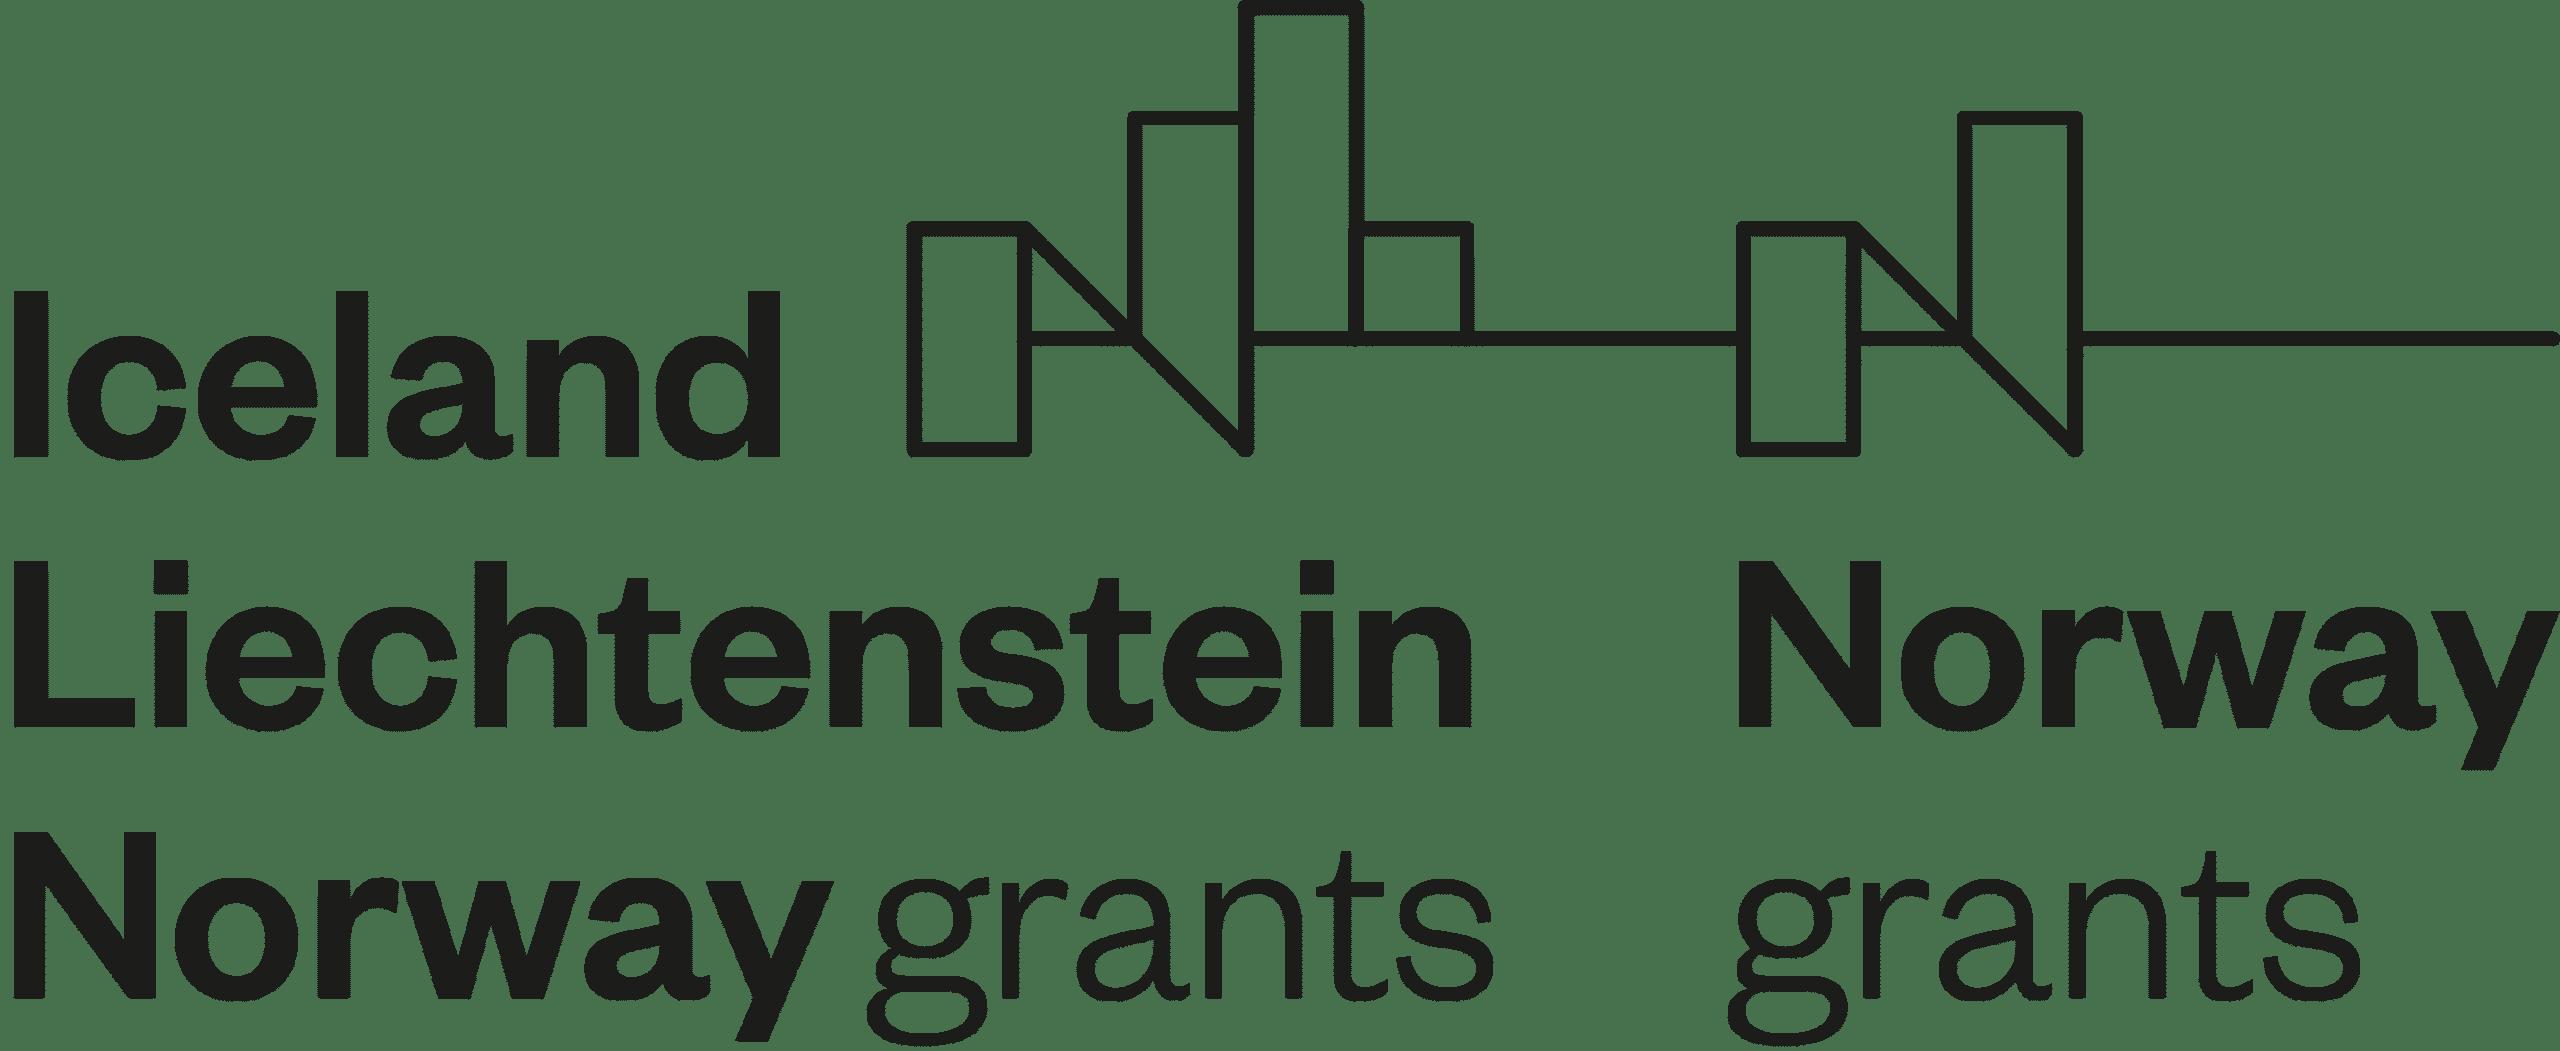 EEA-and-Norway_grants@4x (1)